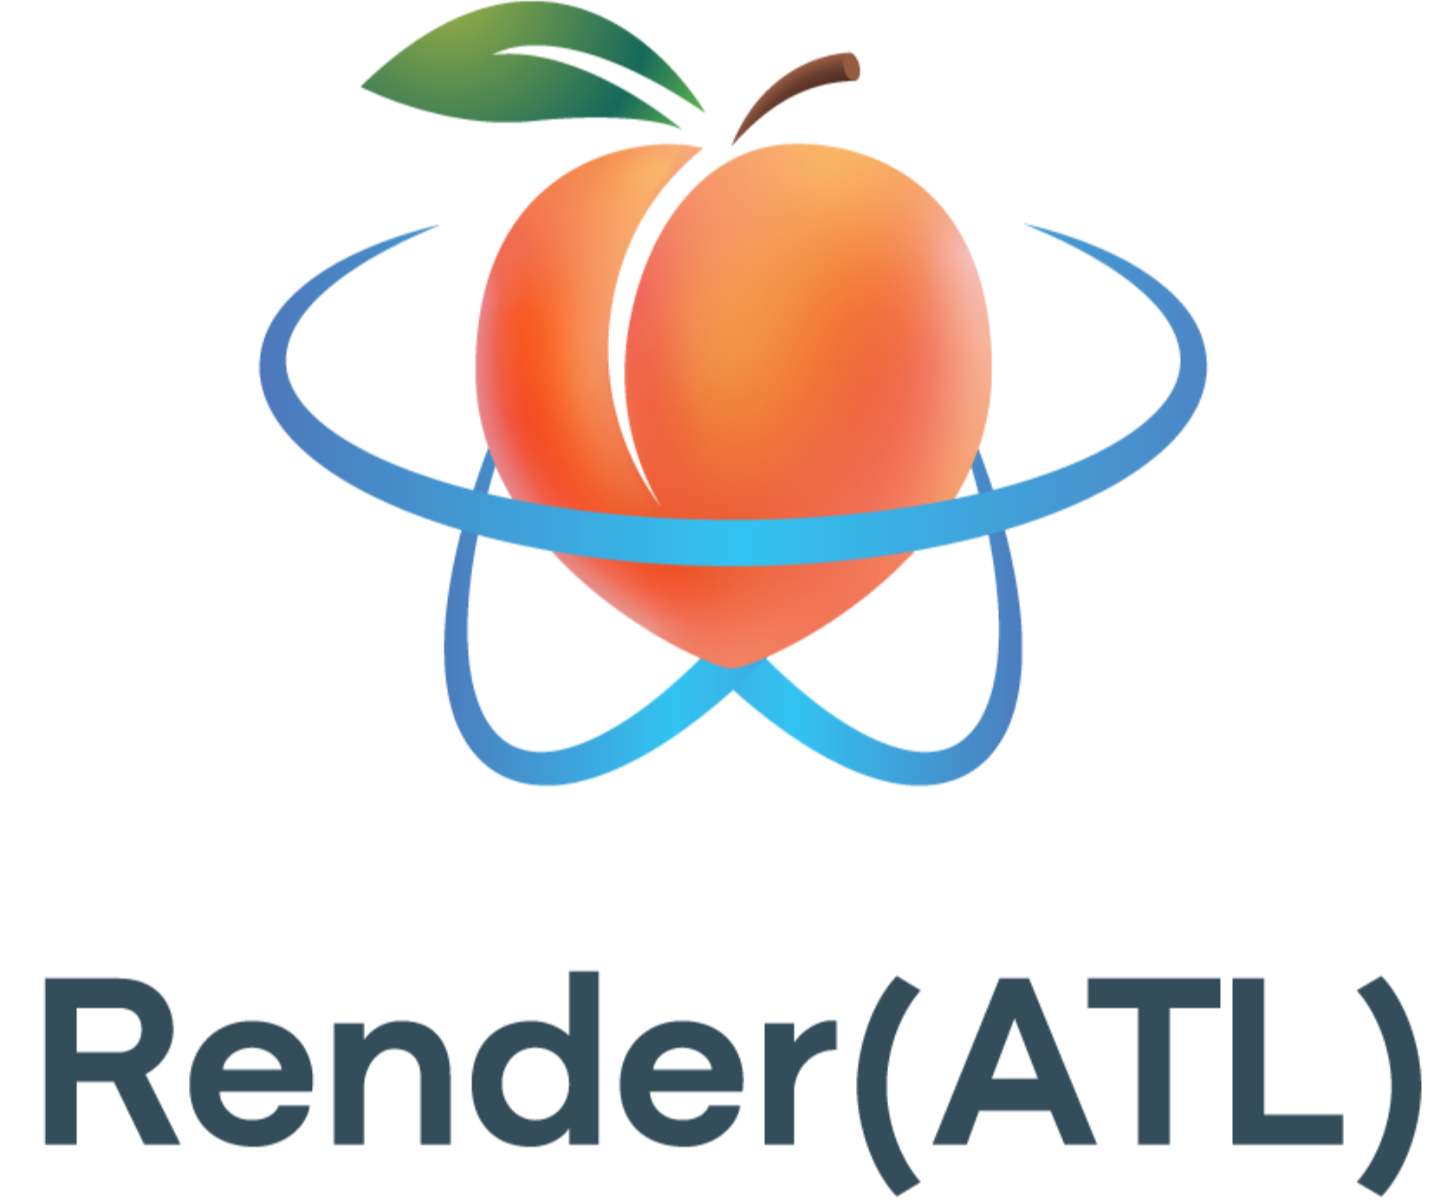 Render-Atlanta Conference logo